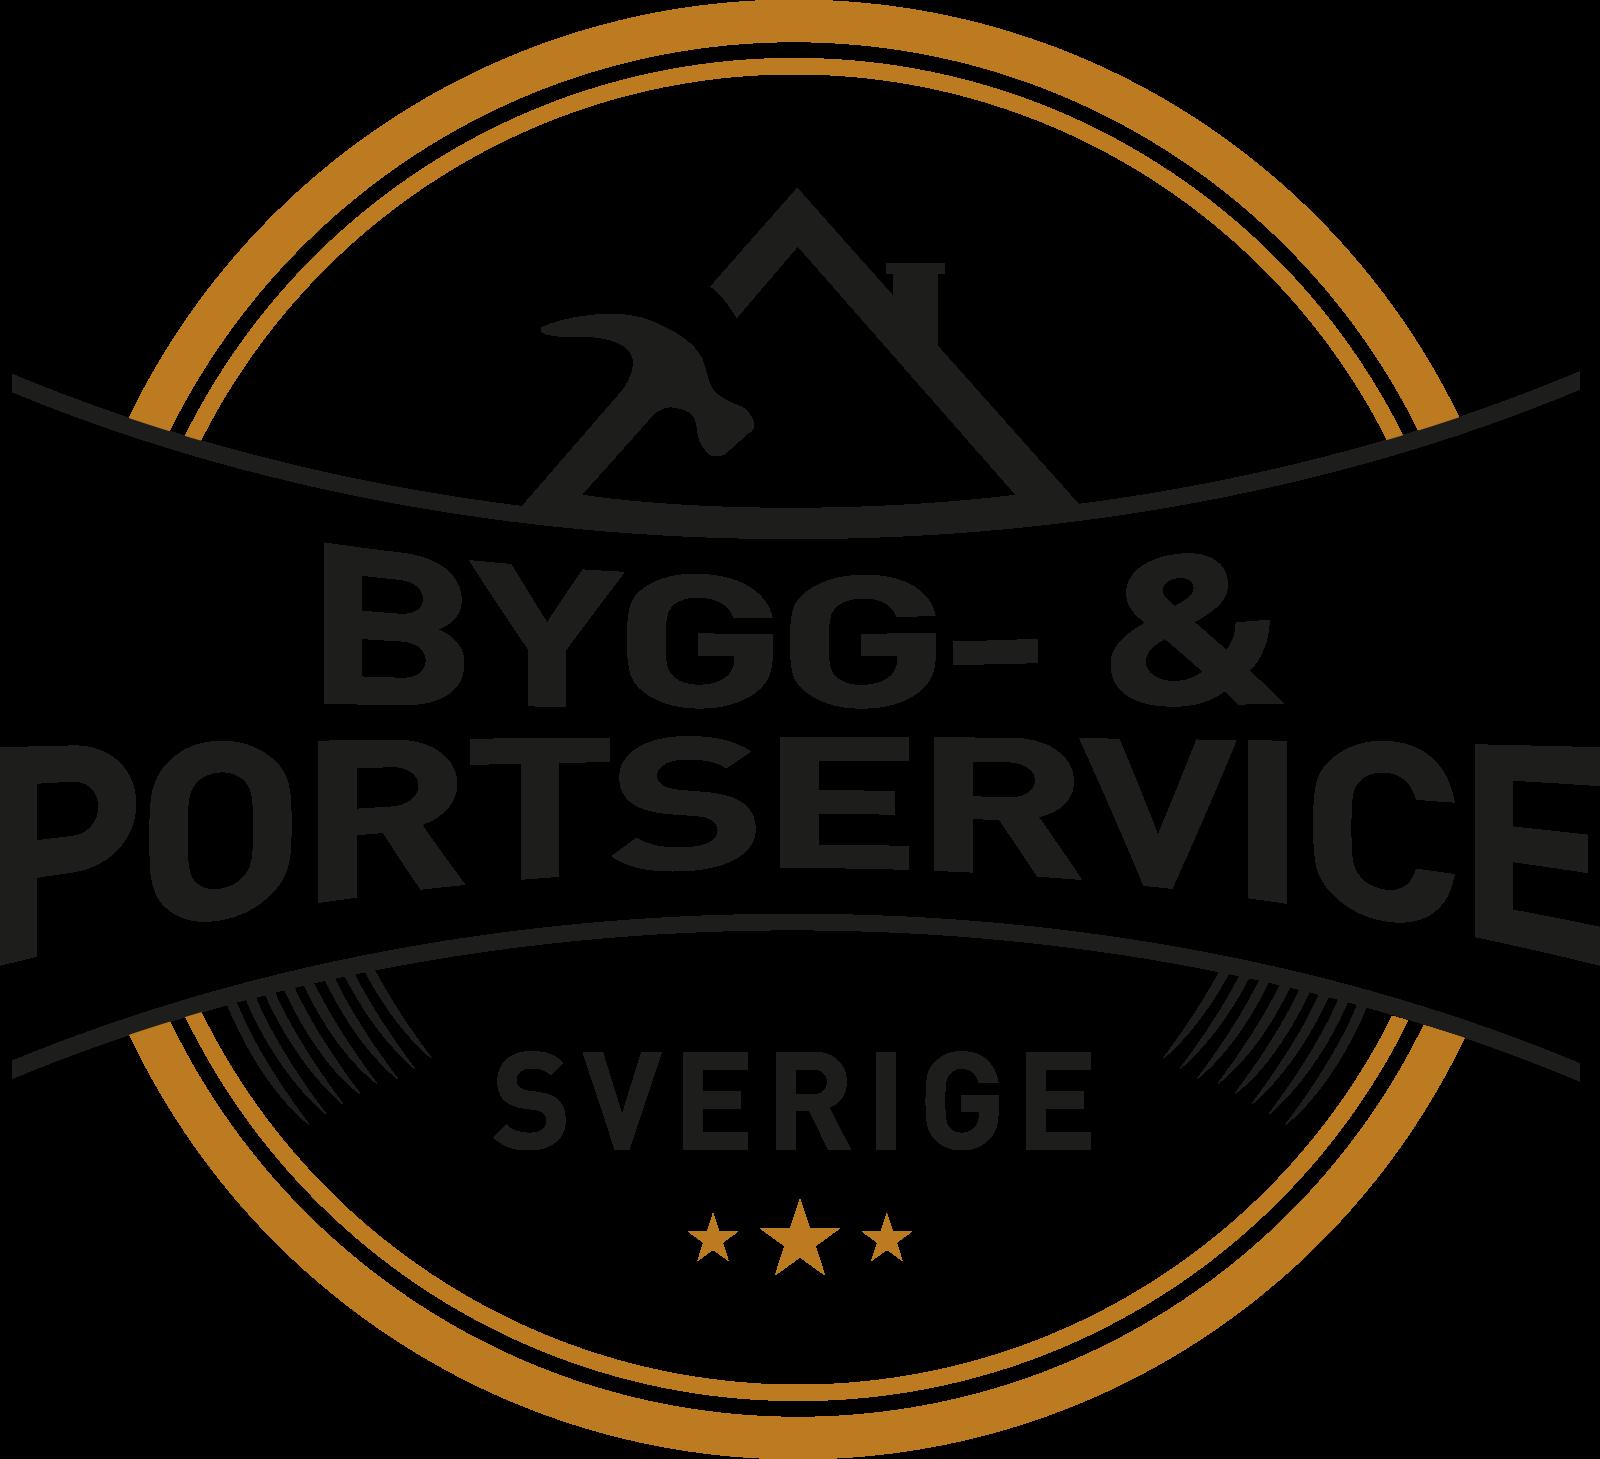 Bygg & Portservice